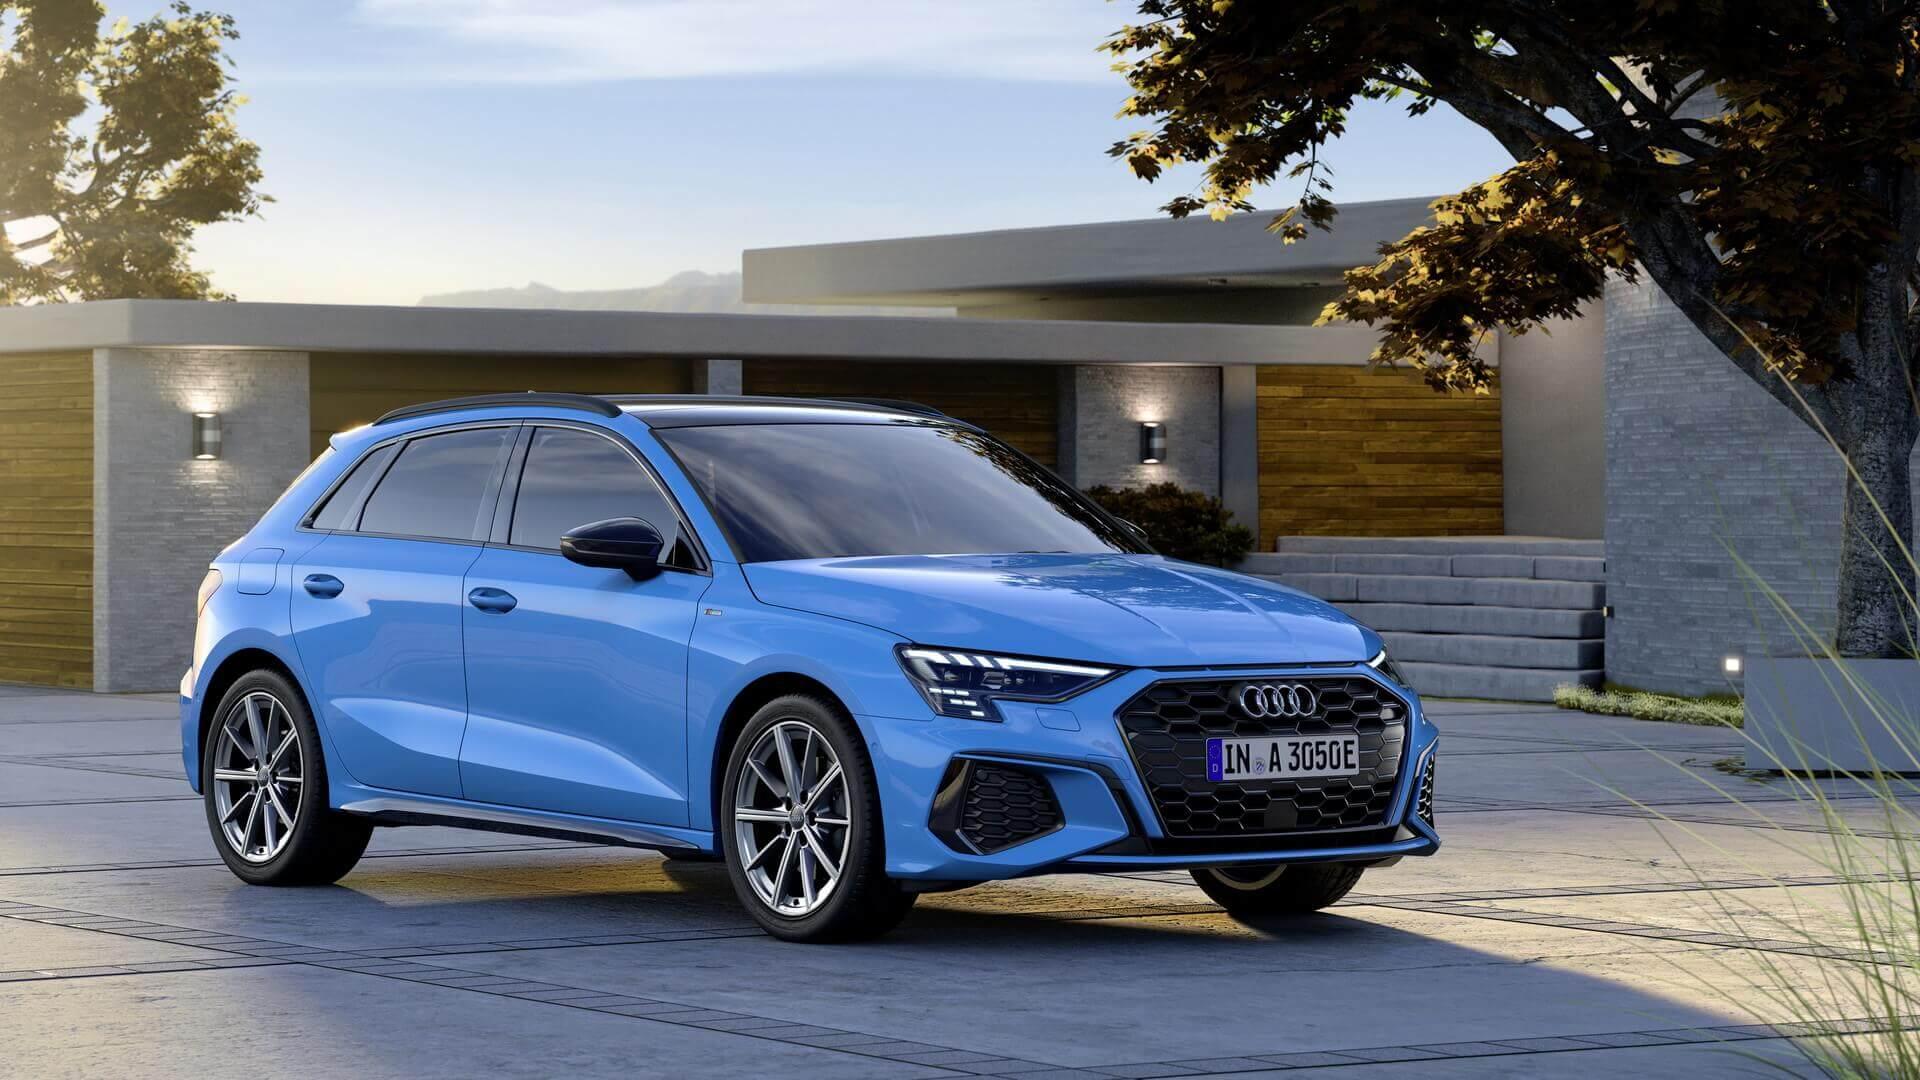 Плагин-гибрид Audi A3Sportback 40TFSI e